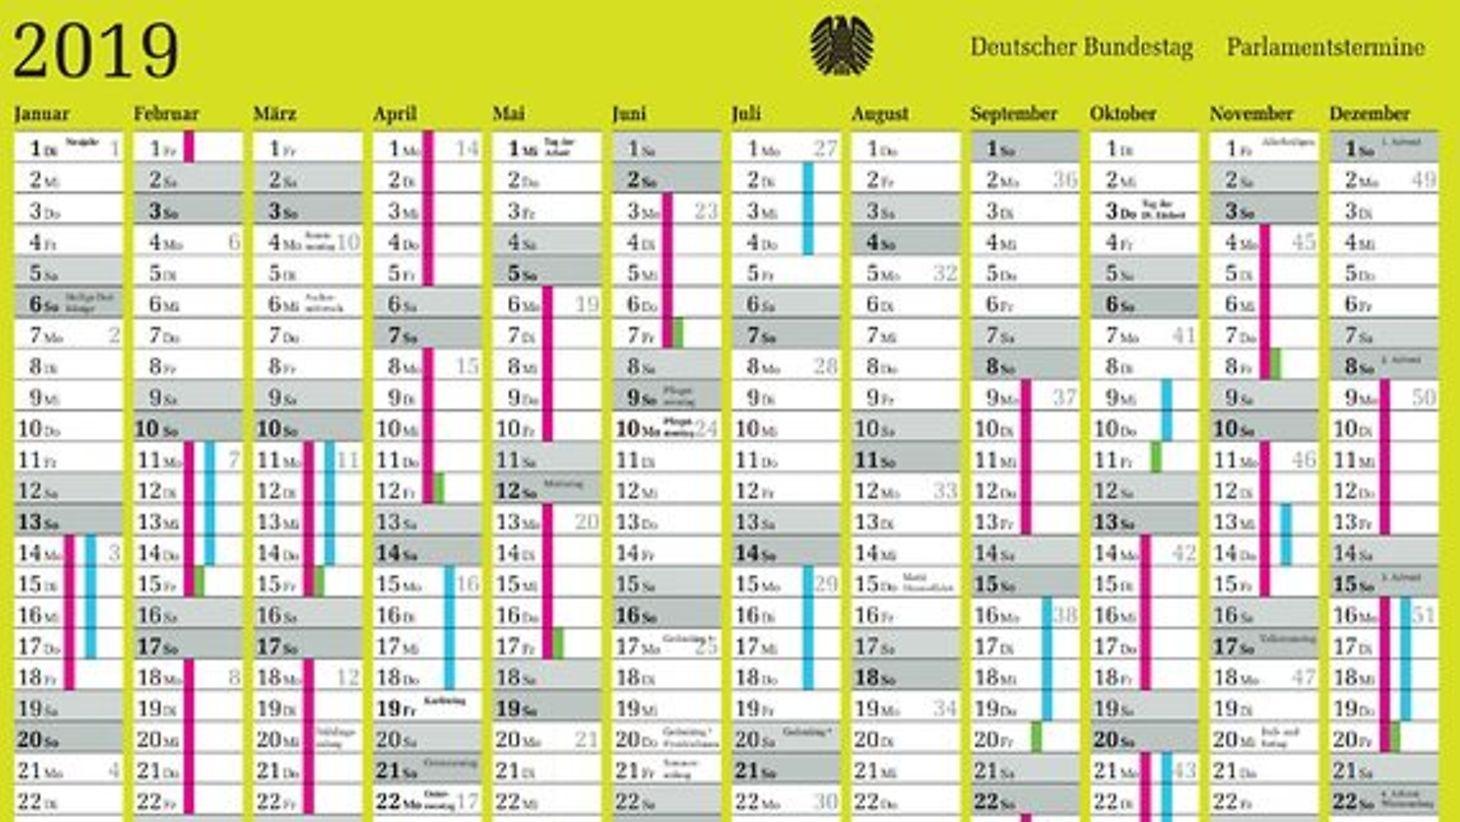 German Bundestag - Parliamentary Calendar